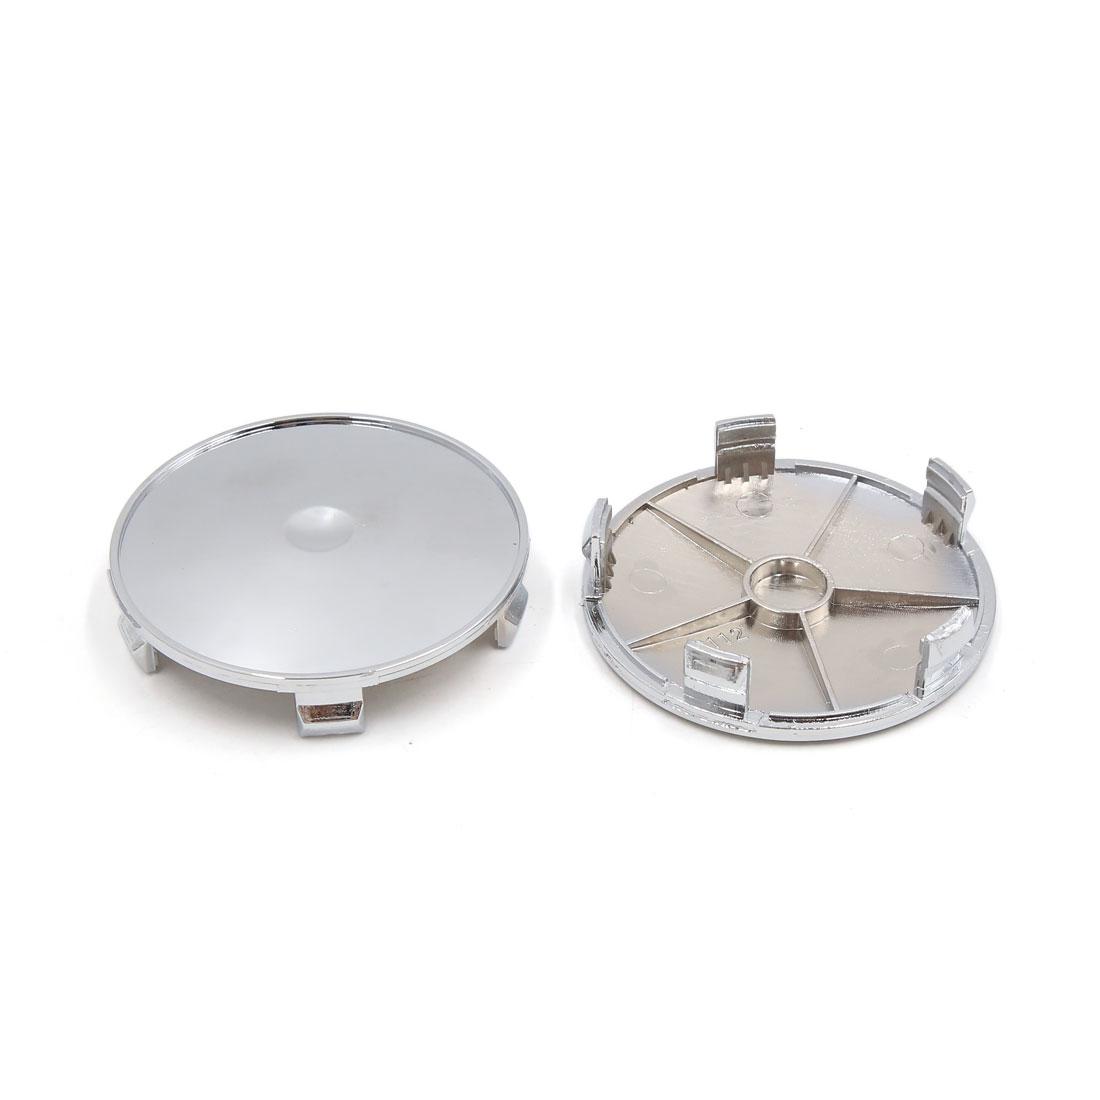 2 Pcs Silver Tone Chrome 68mm Dia 5 Lugs Car Wheel Rims Center Cap Hub Cover